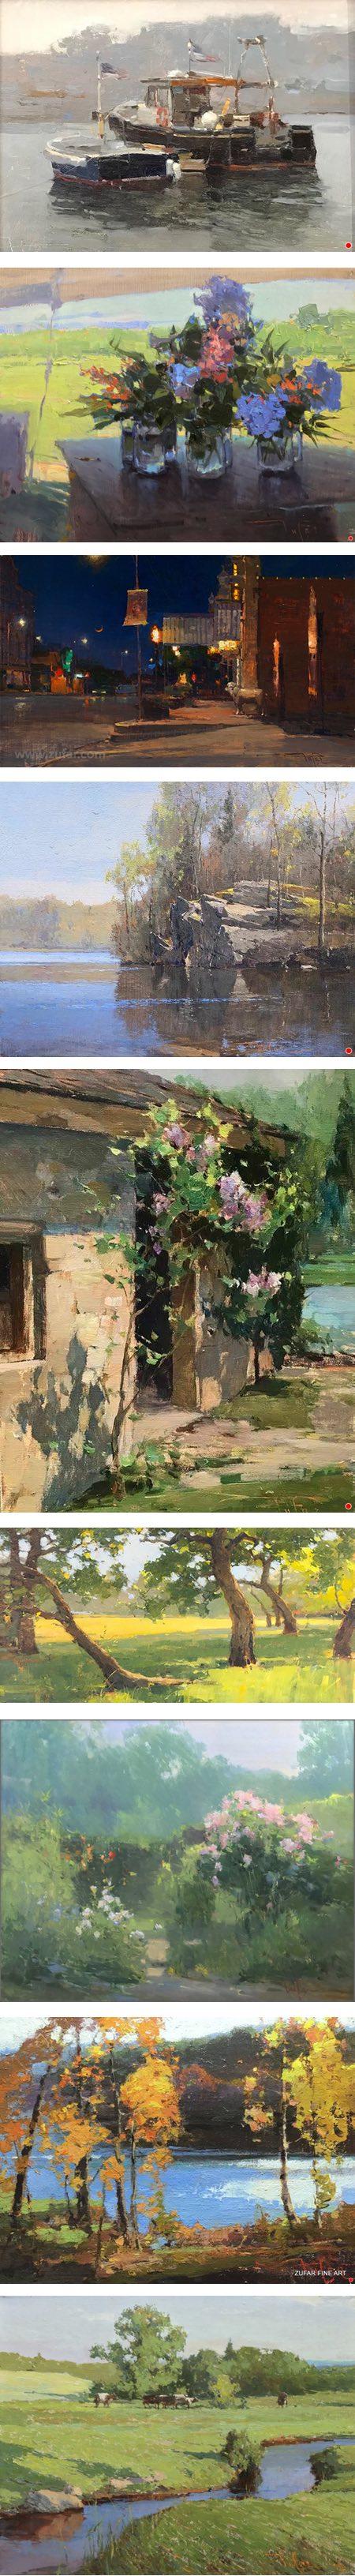 Zufar Bikbov paintings